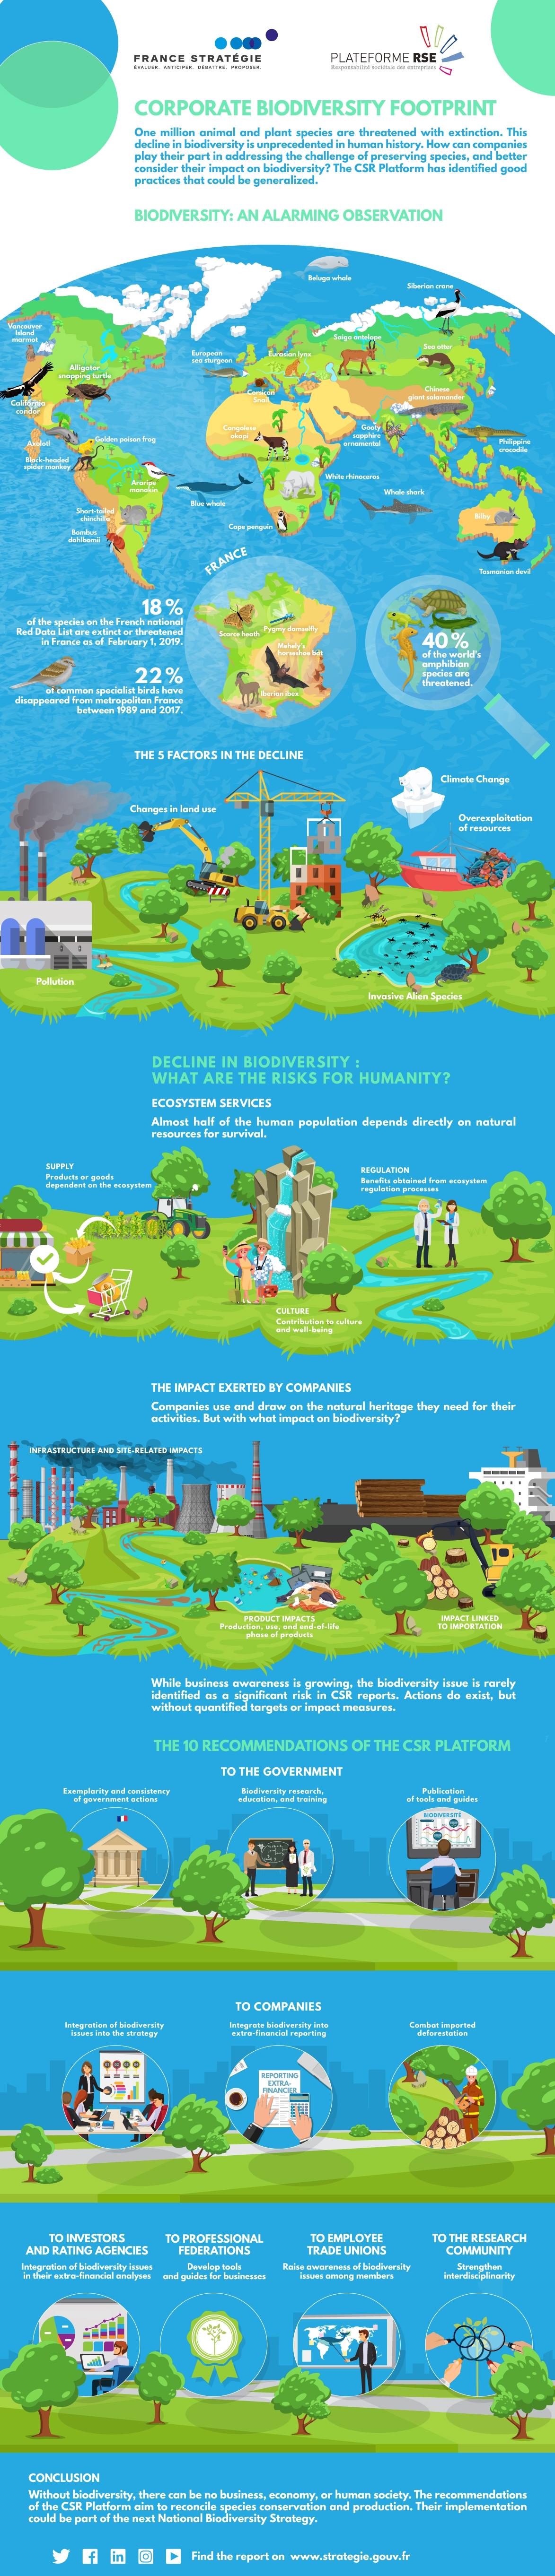 Corporate biodiversity footprint